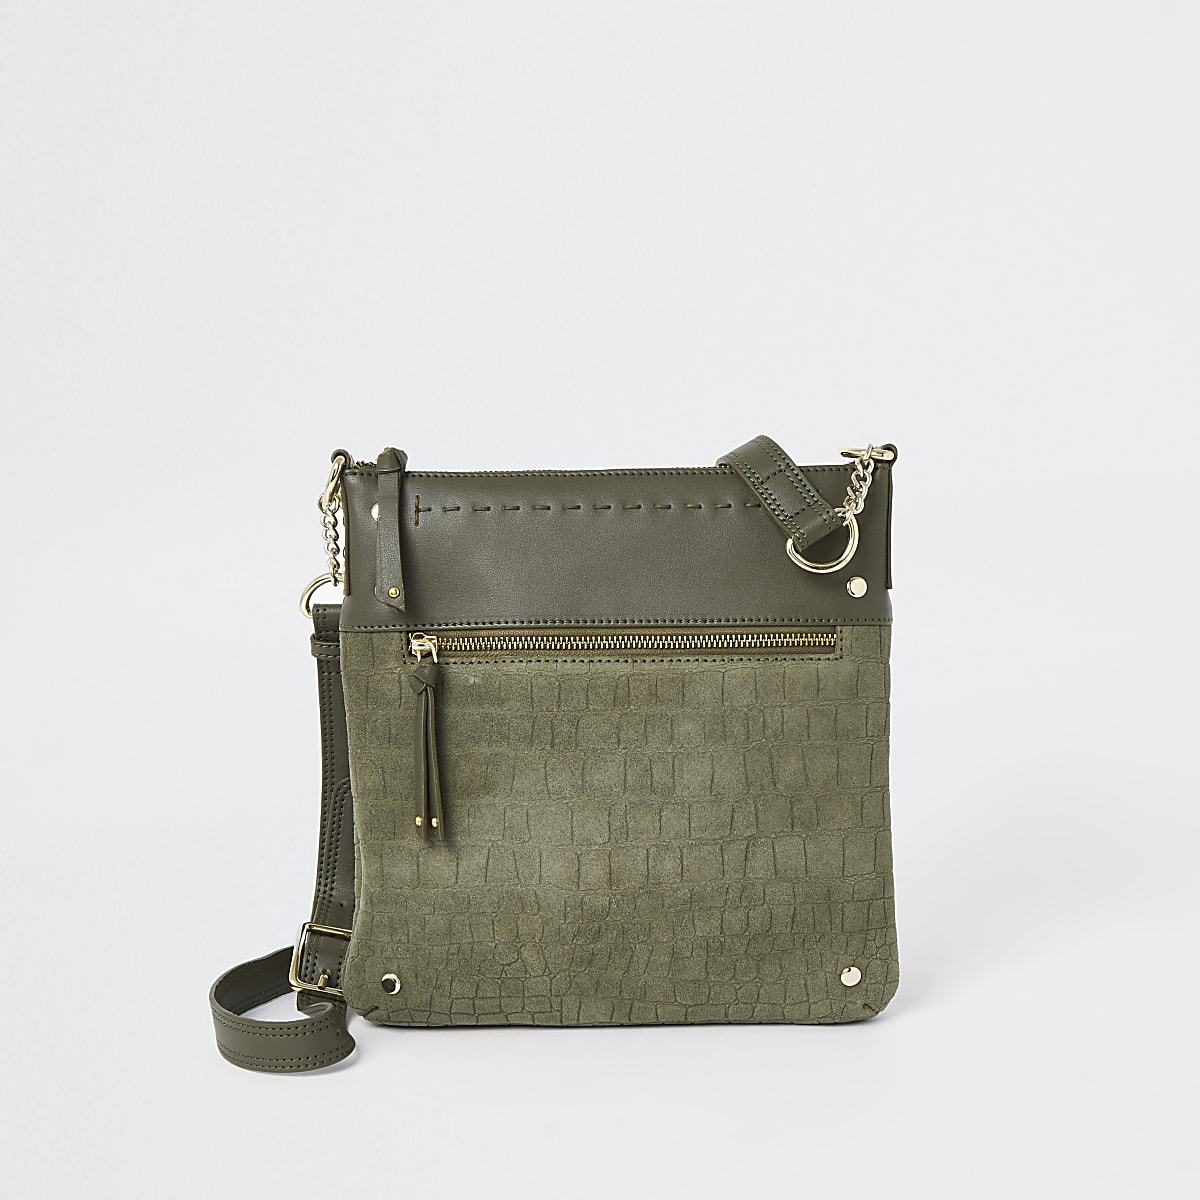 Khaki leather studded messenger bag